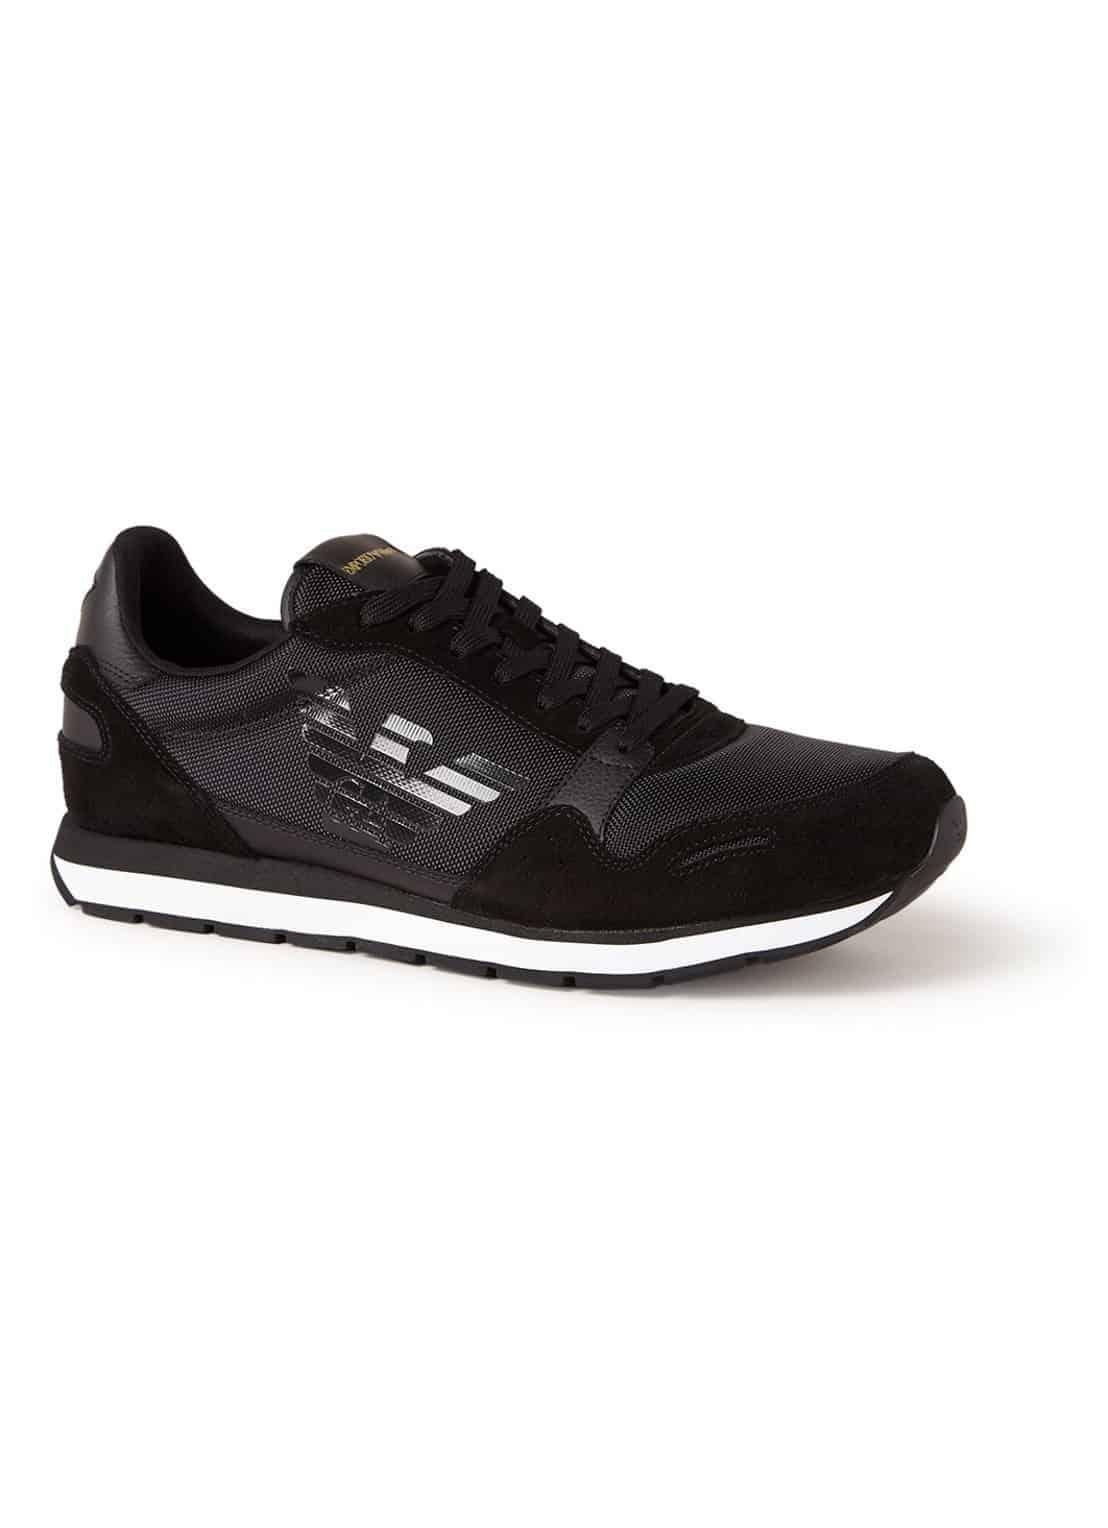 Emporio Armani Sneaker Met Details Van Suède En Leer